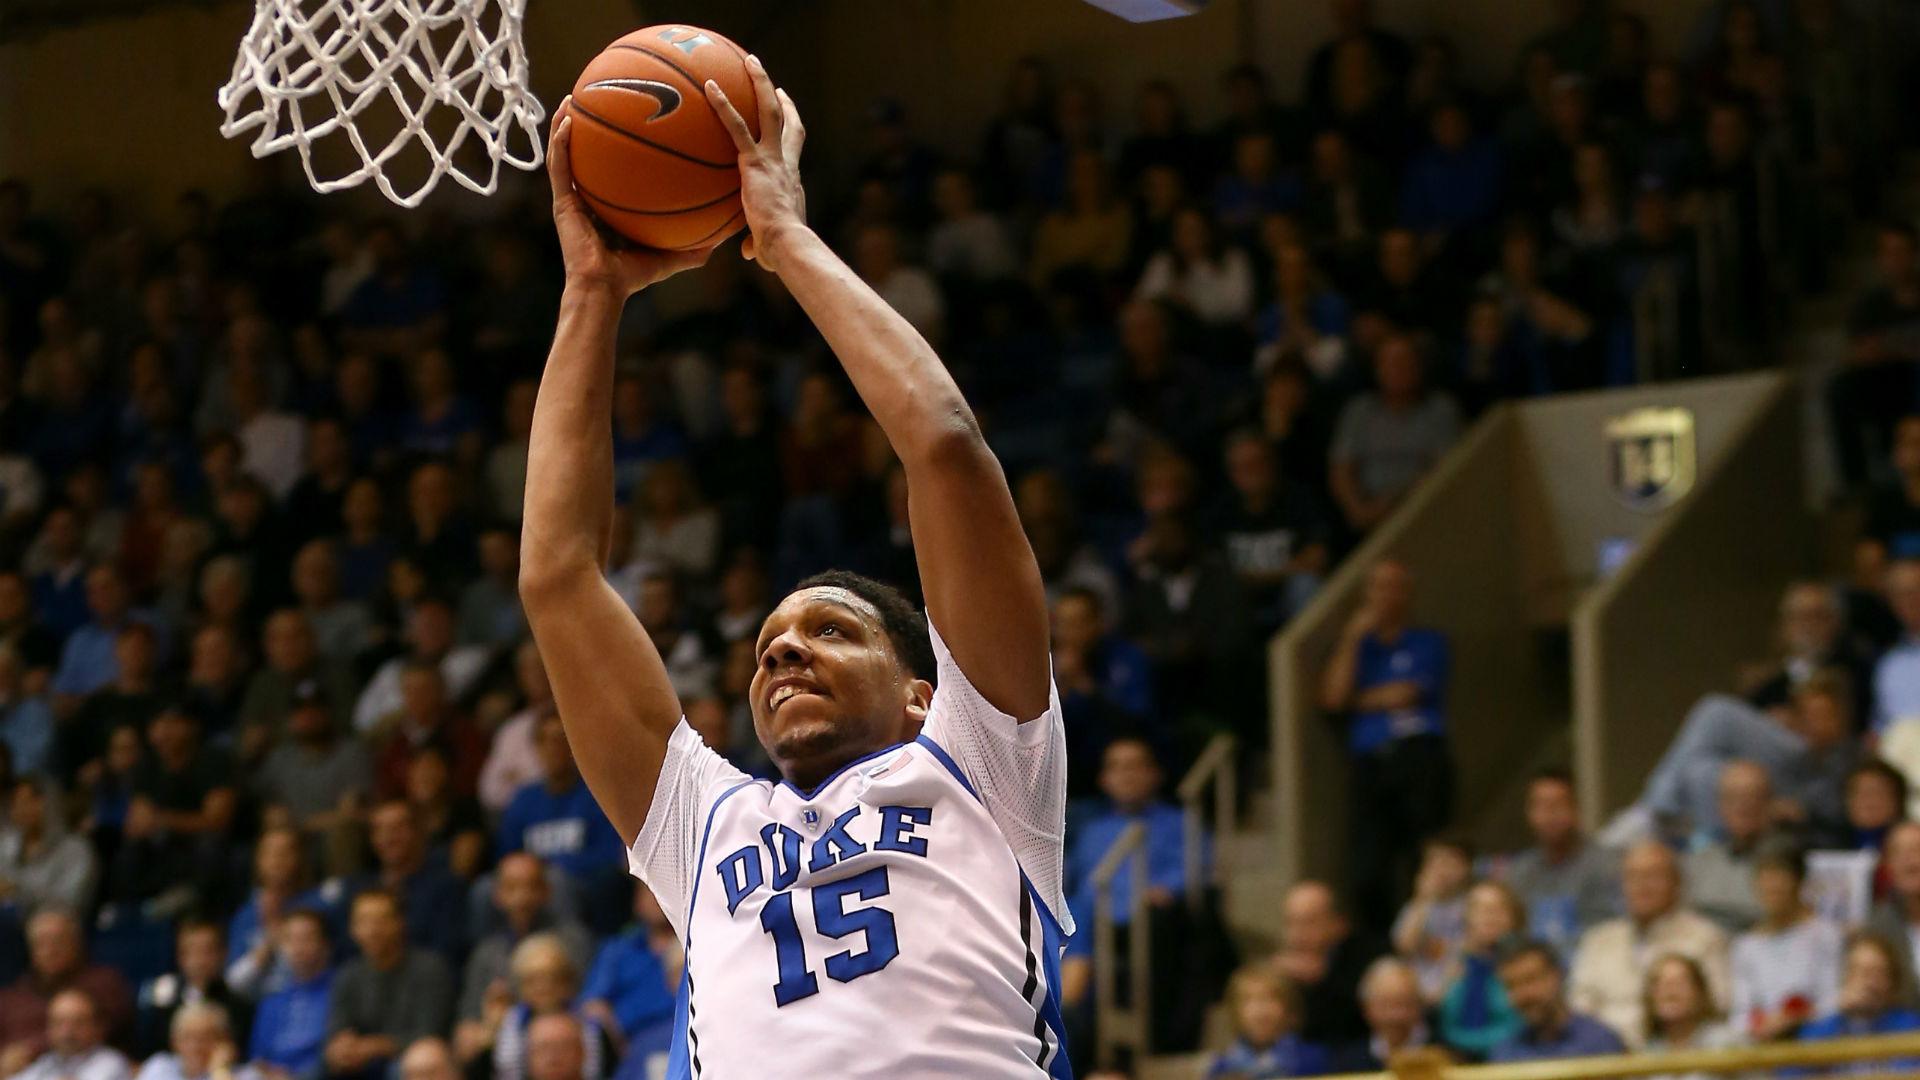 AccuScore's college basketball pick of the day – North Carolina at Duke